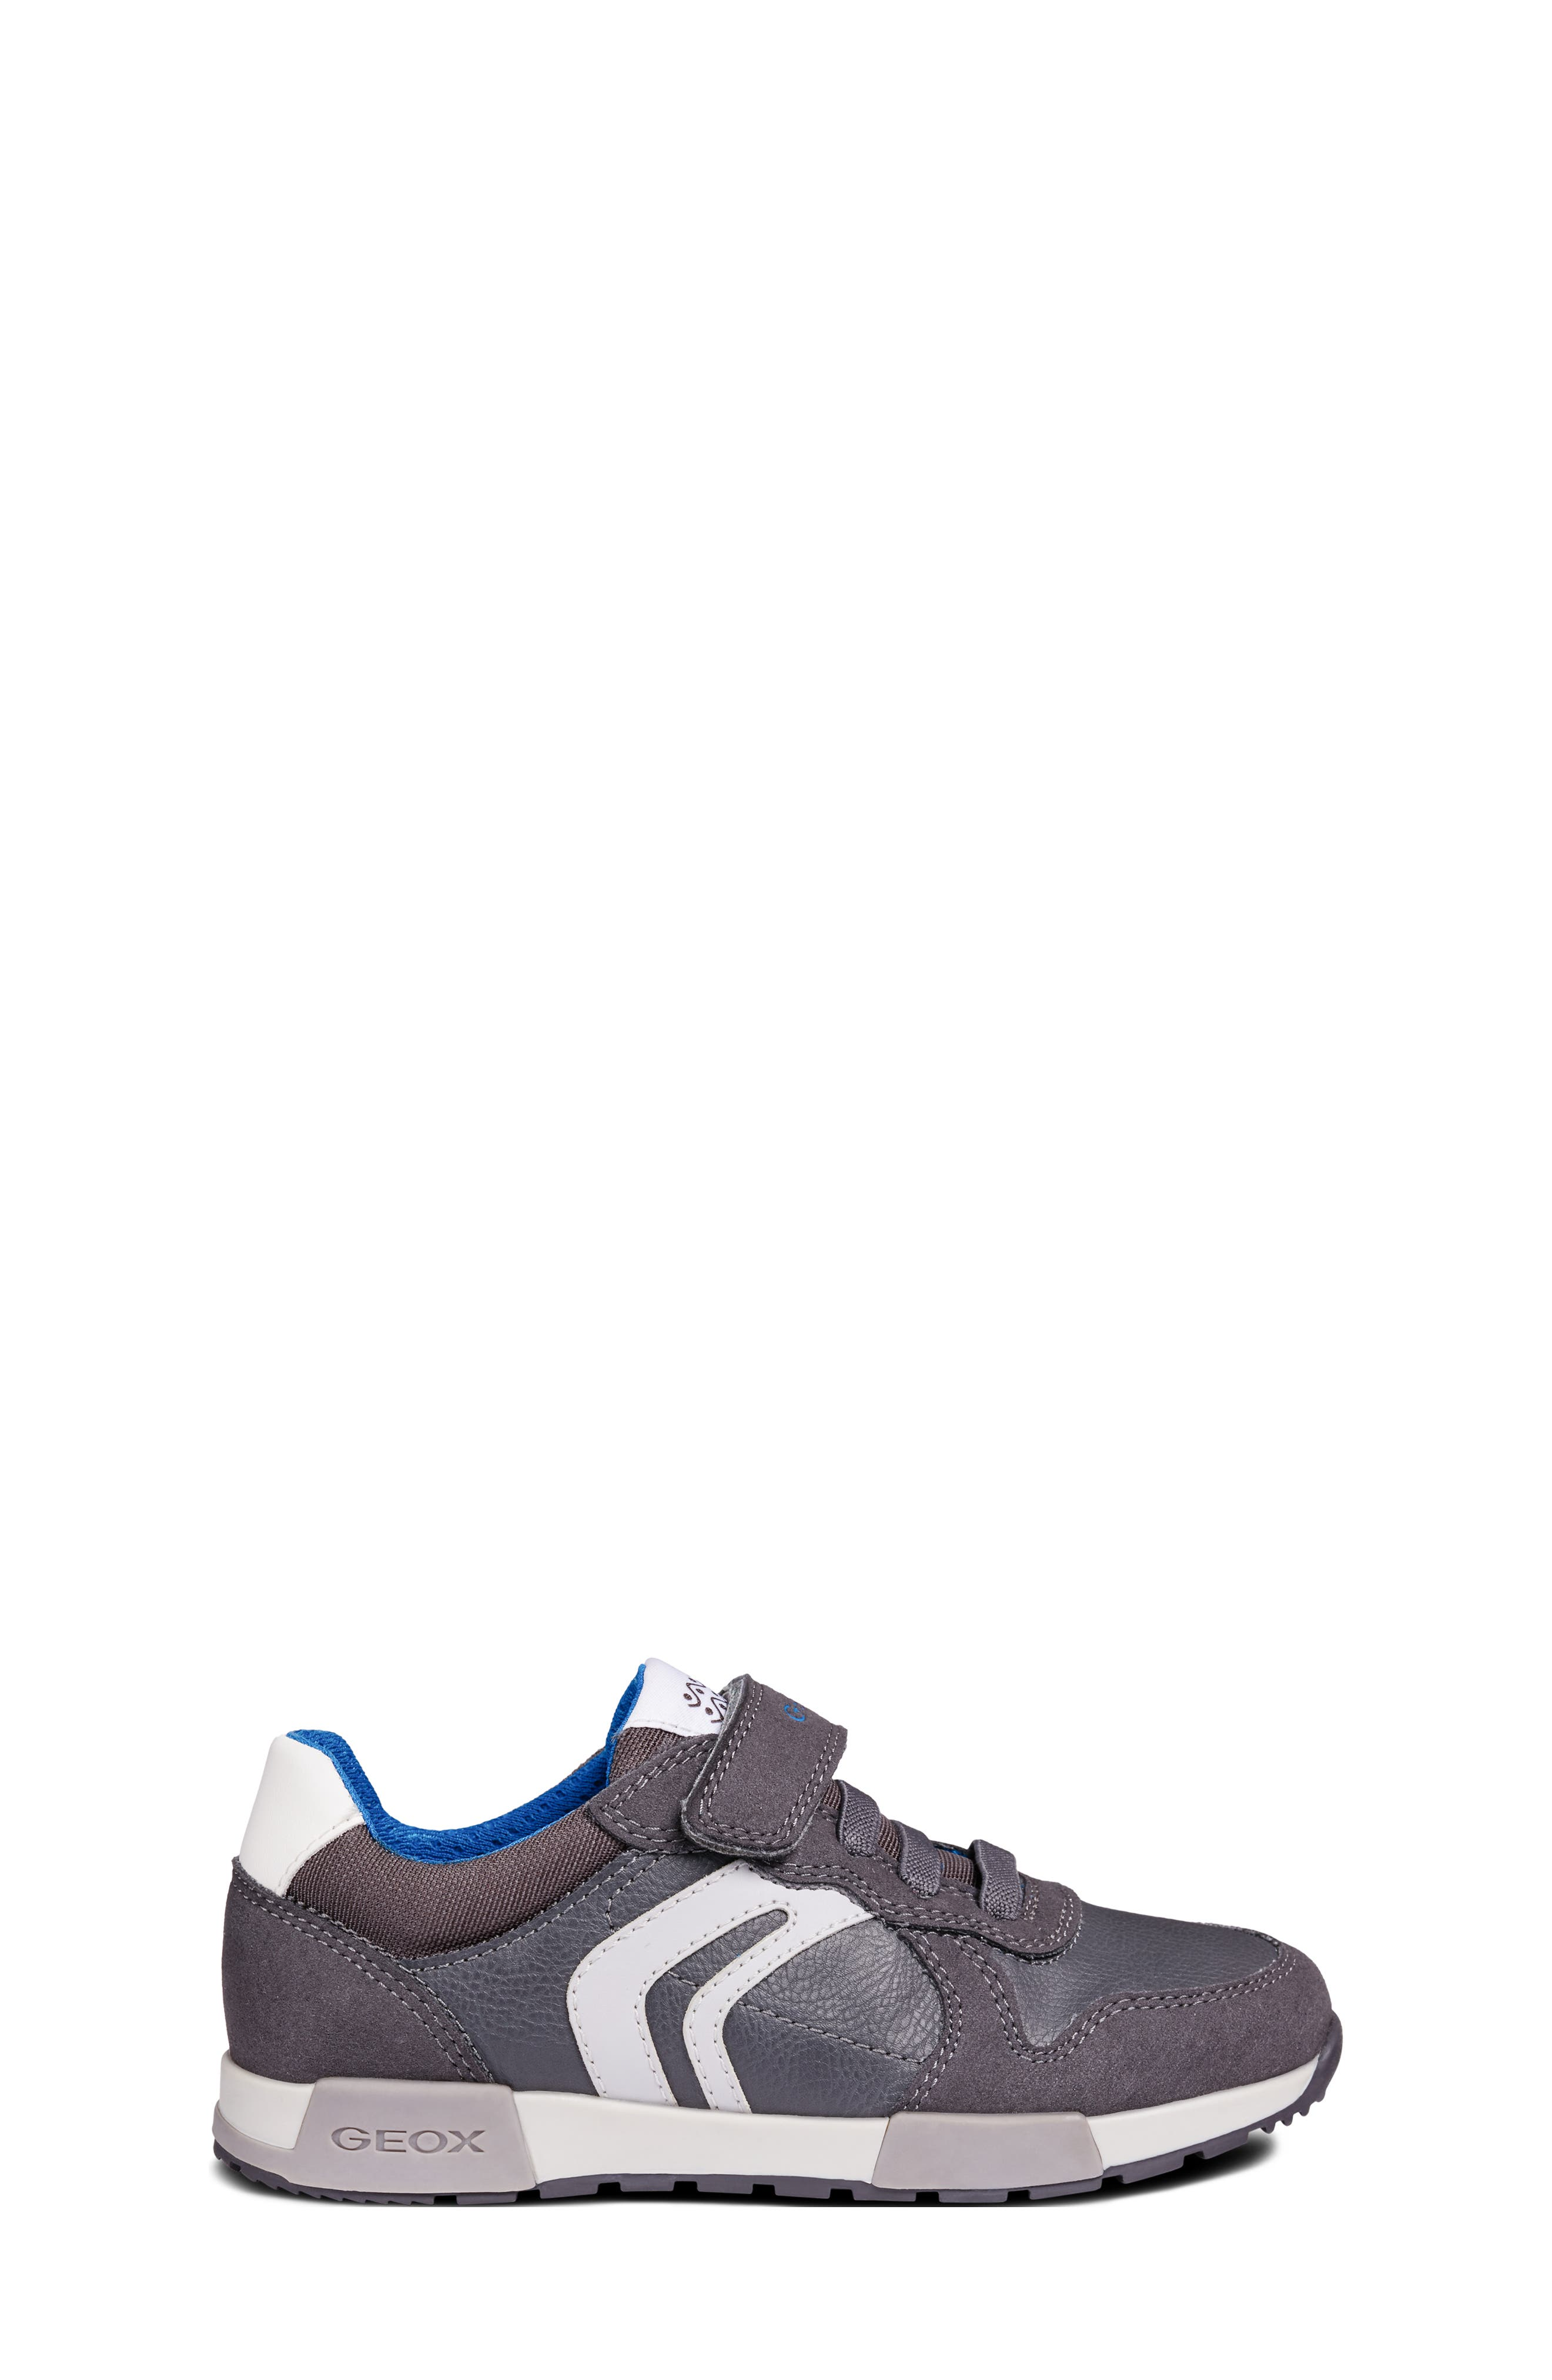 Alfier Boy Sneaker,                             Alternate thumbnail 3, color,                             DARK GREY/GREY